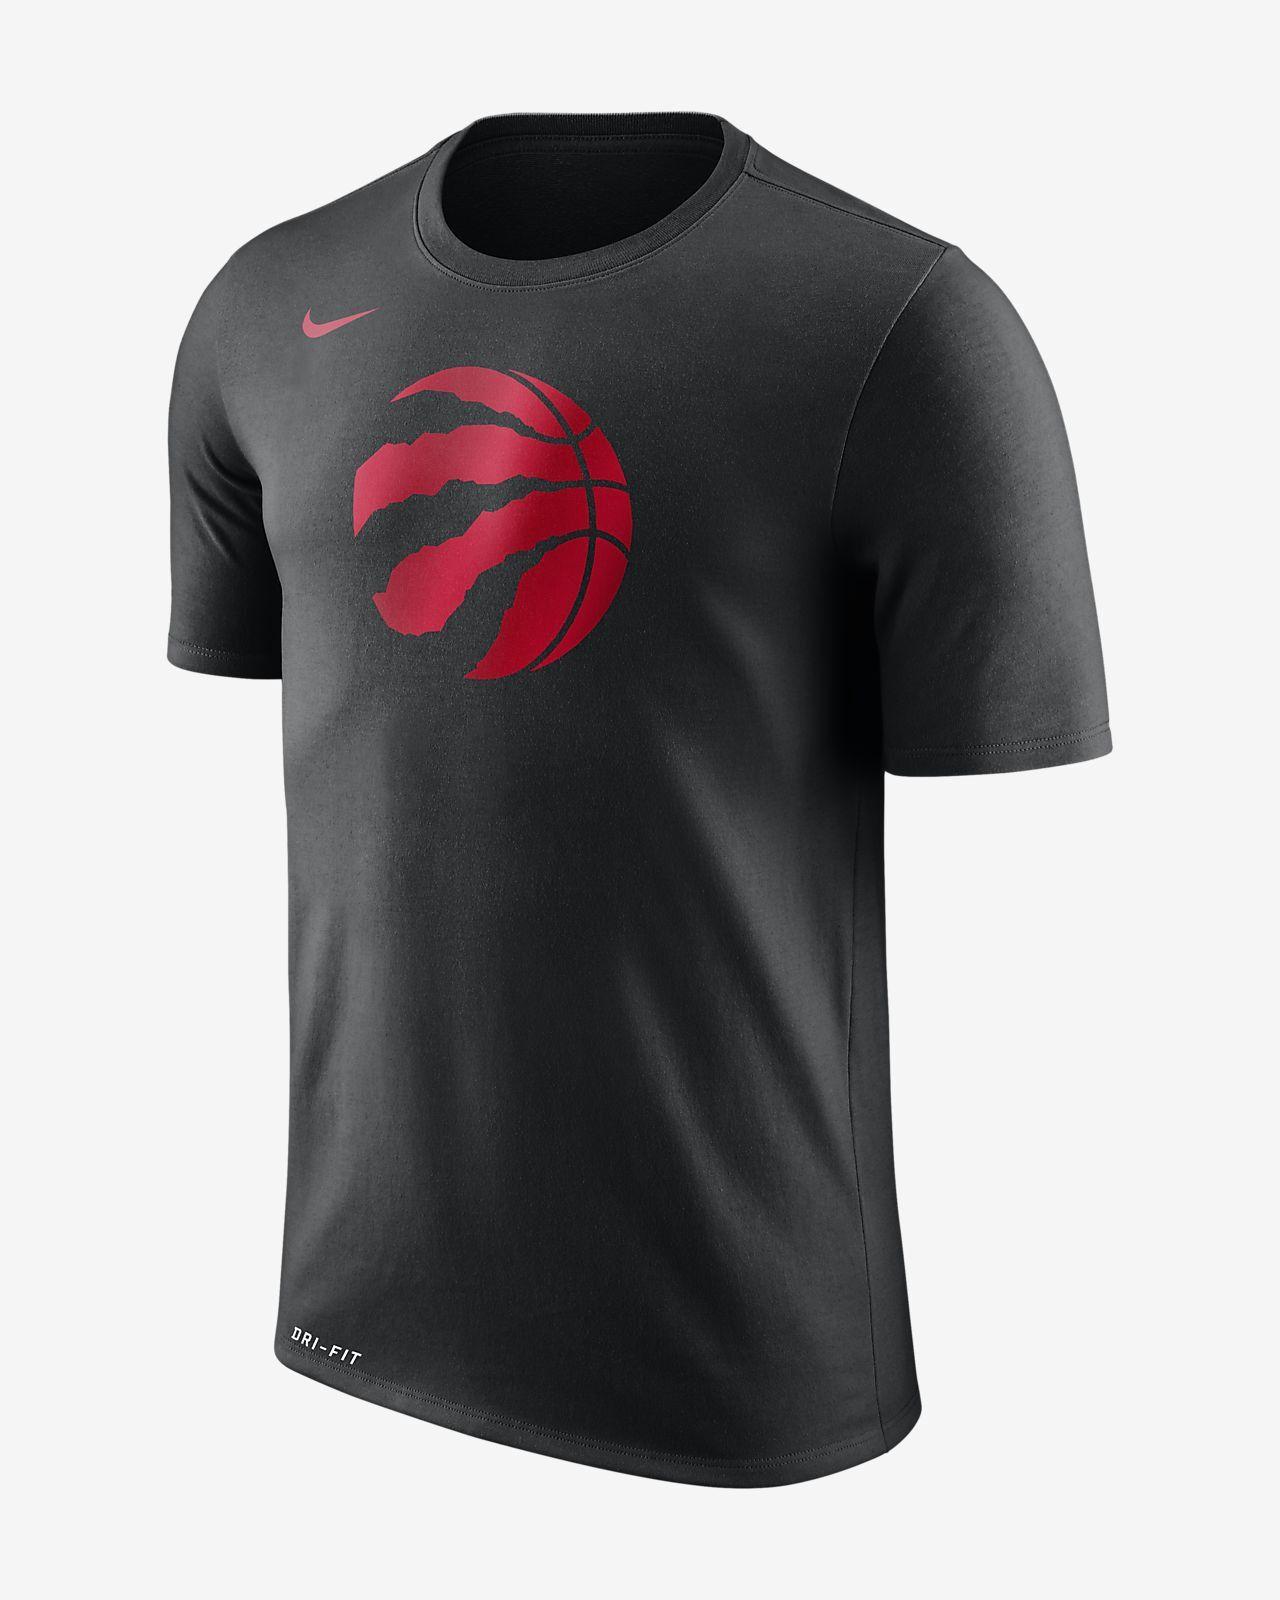 Los Angeles Lakers Nike leichte NBA Herrenjacke. Nike BE